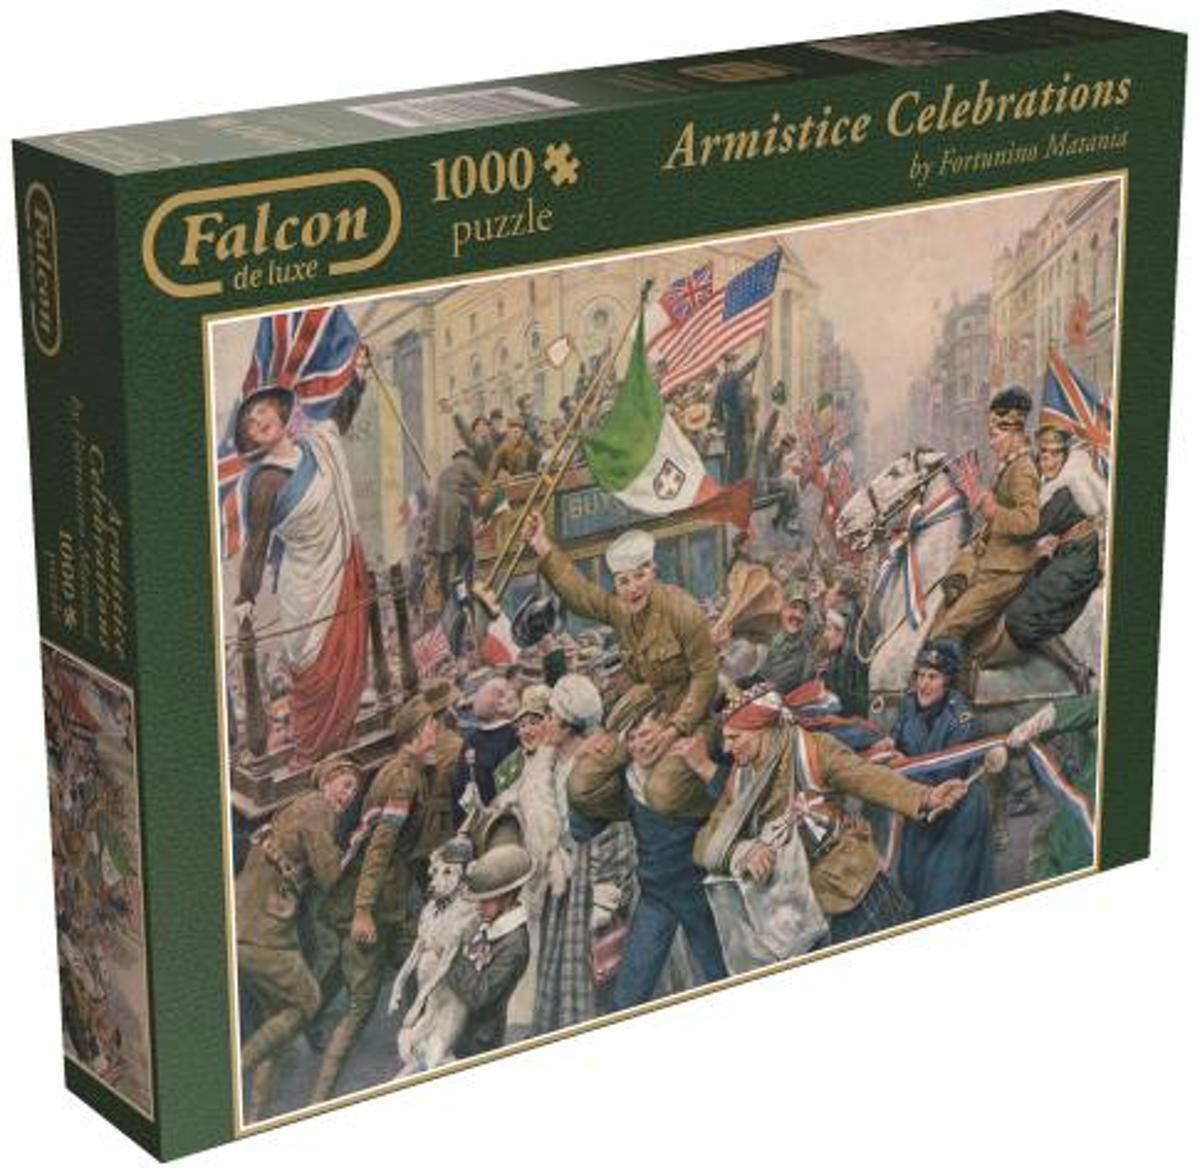 Armistice Celebrations - Puzzel - 1000 stukjes